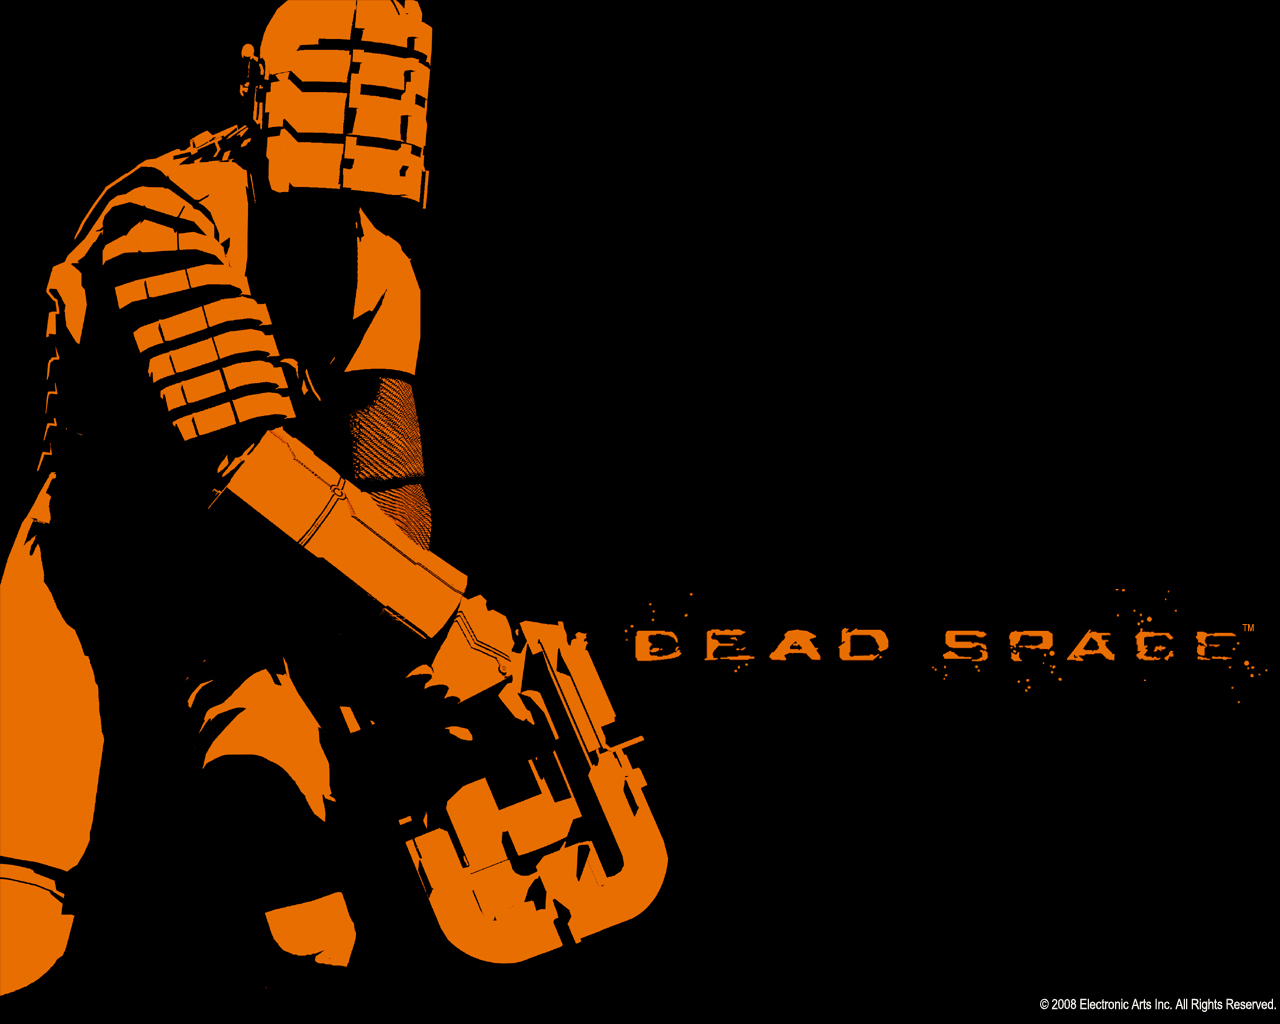 Dead Space Picture - HD Desktop Wallpapers